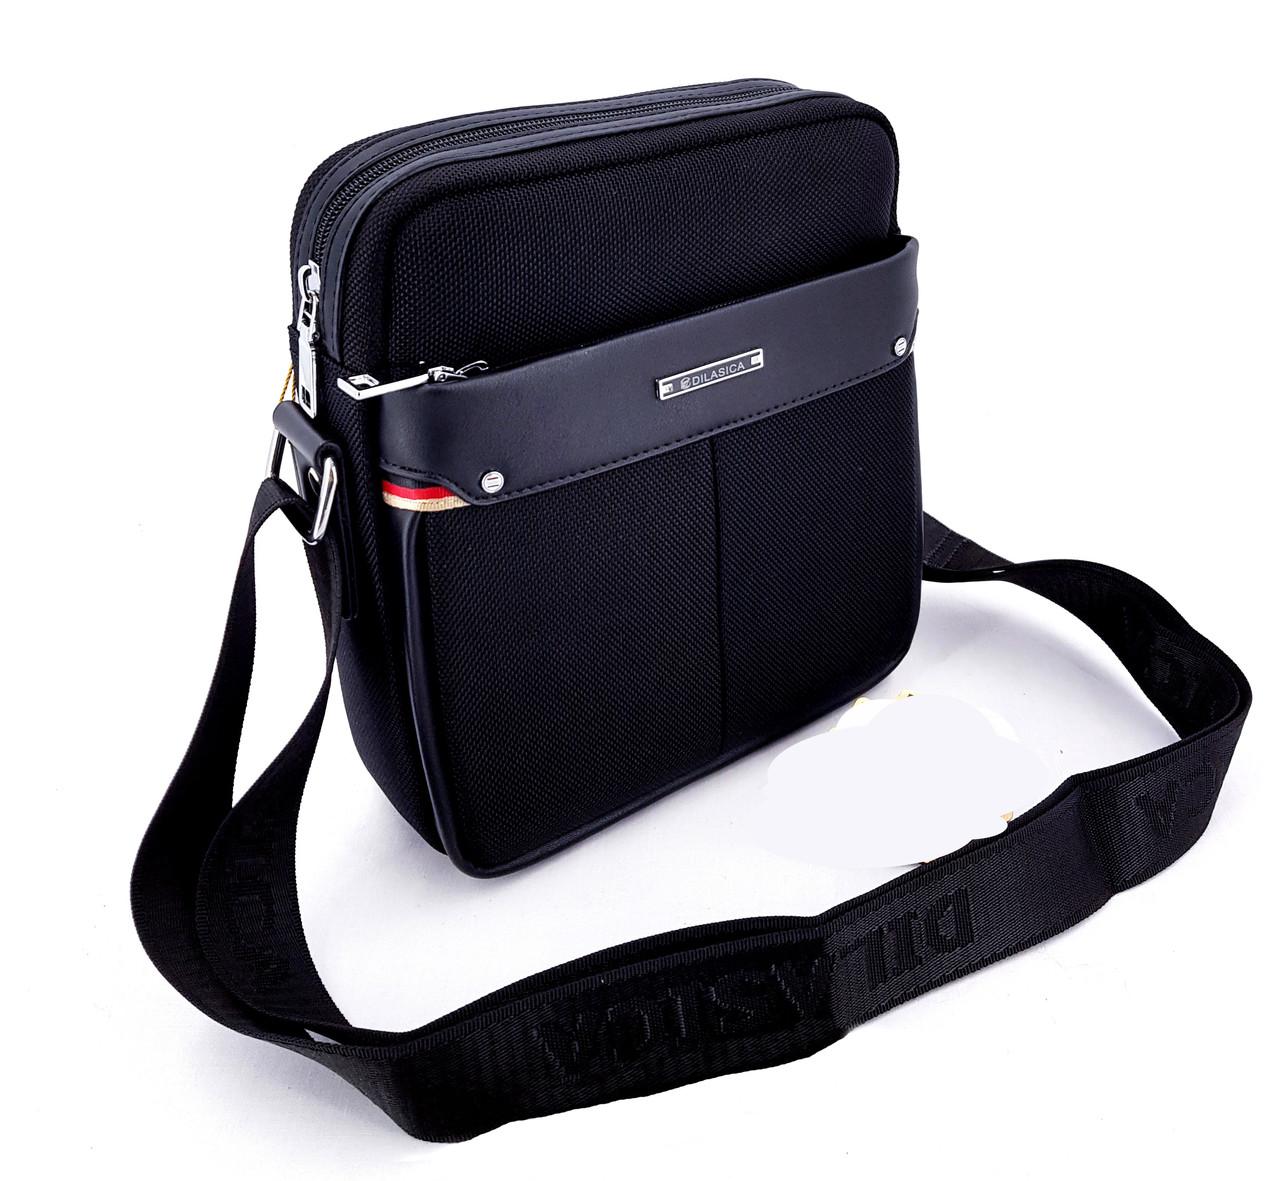 63762d656690 Черная Мужская сумка через плечо Dilasica сумка-планшетка новинка -  Интернет магазин Lisbag в Умани